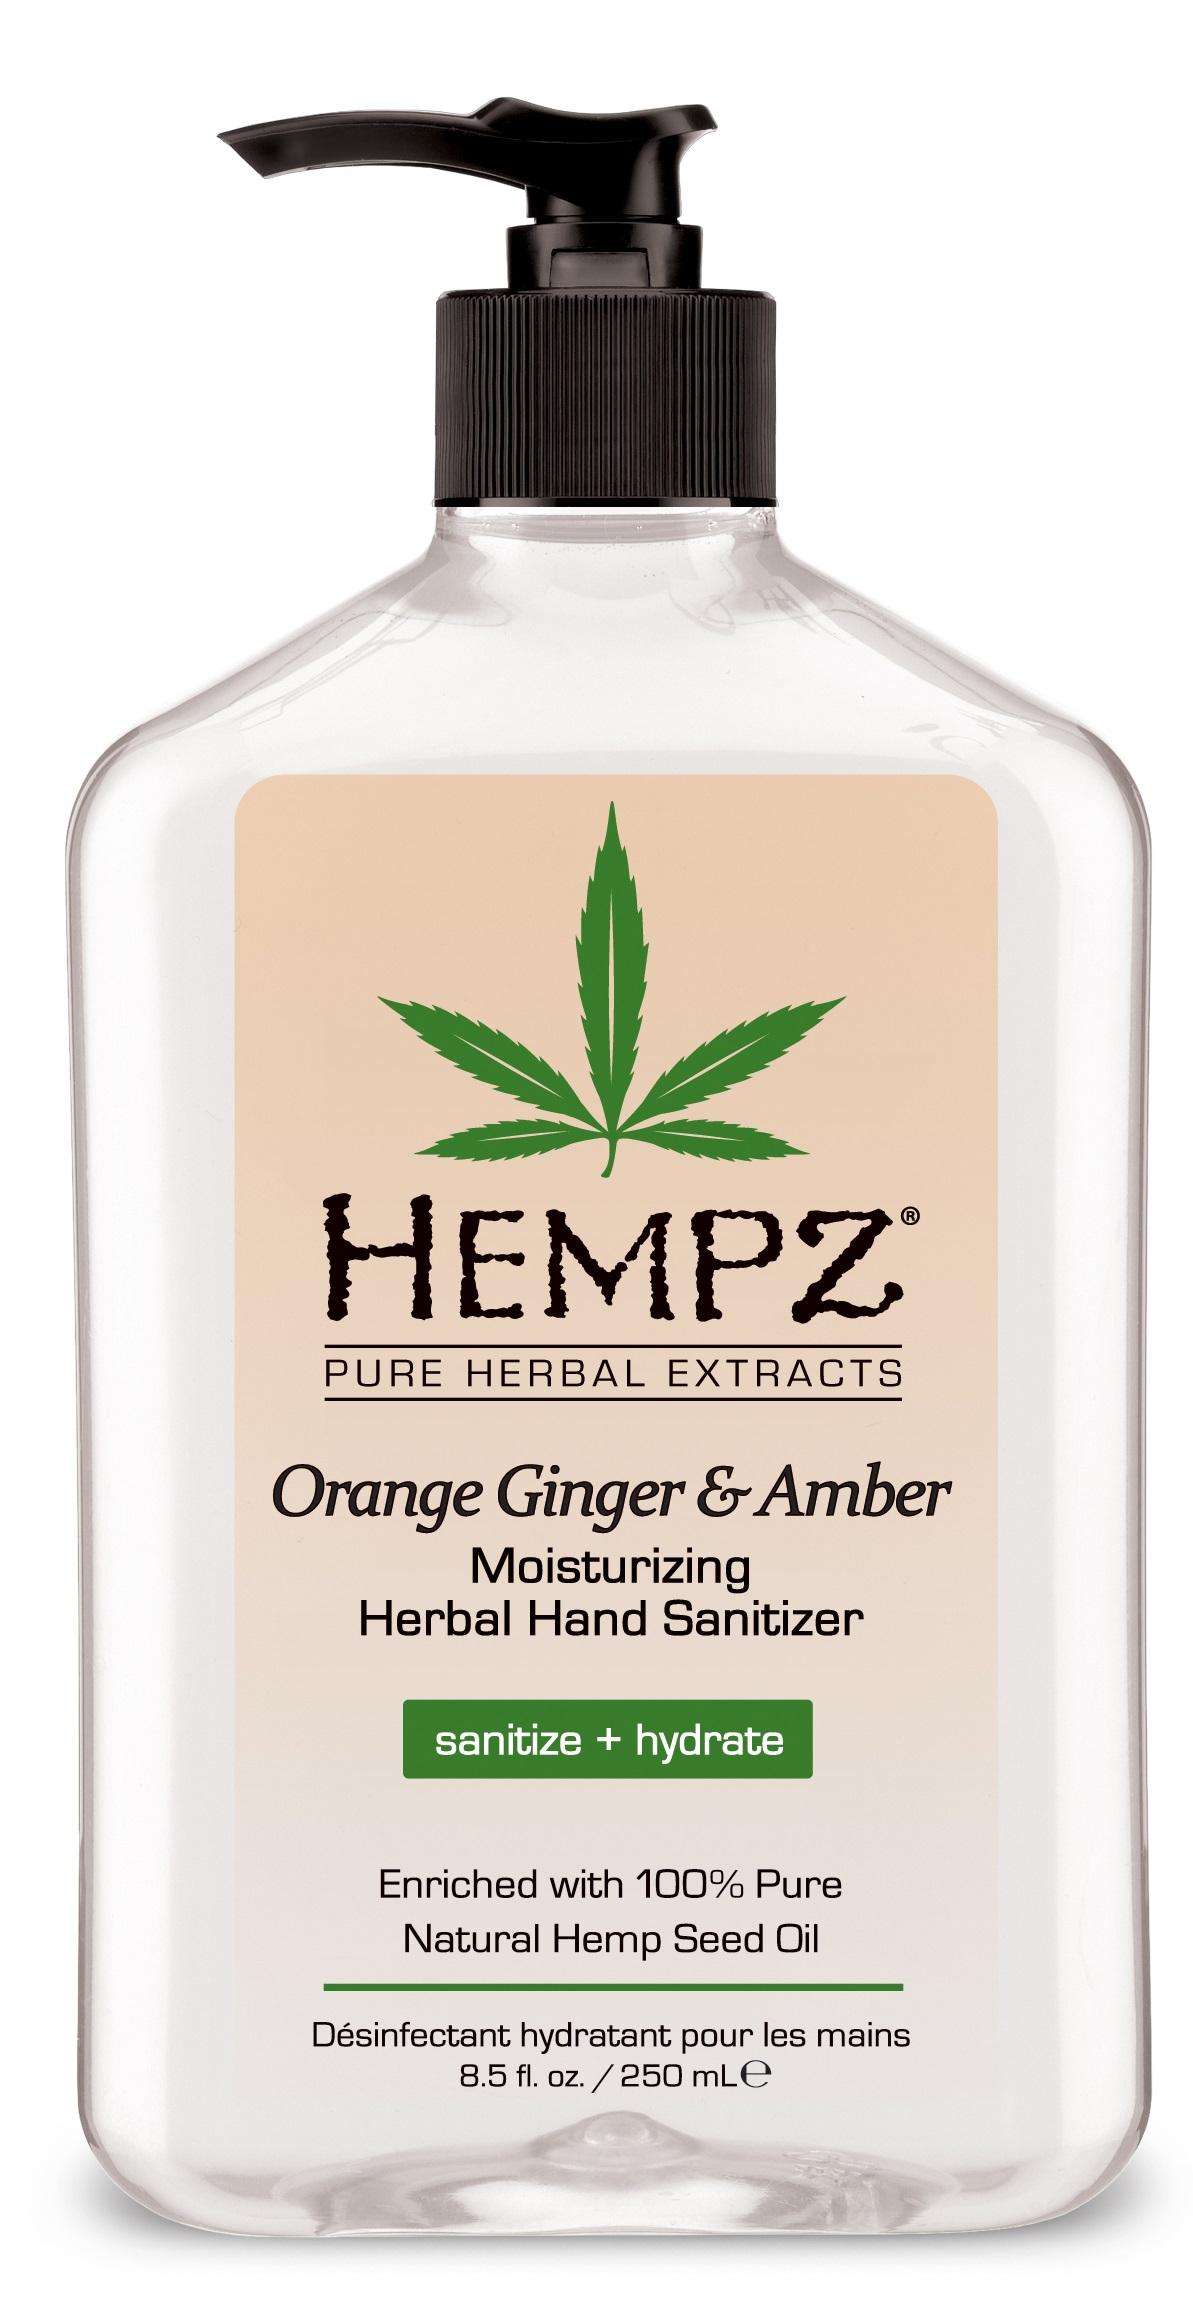 Image of Hempz Herbal Hand Sanitizer 250ml